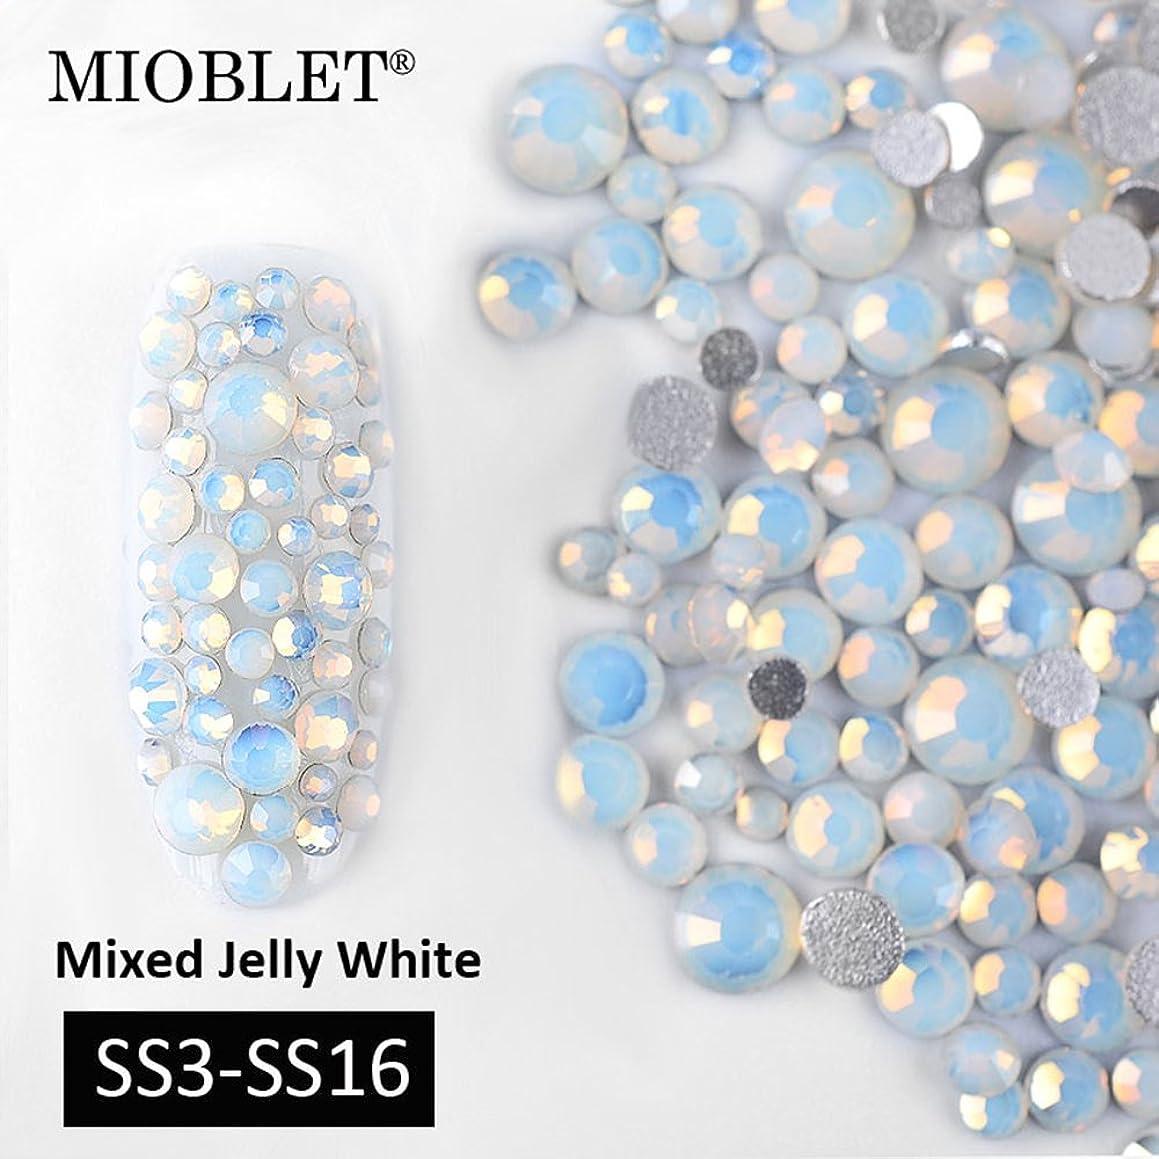 MIOBLET Mix SS3-SS16 Opal White Crystal Nail Art Rhinestones Flatback Glitters Decorations Gems